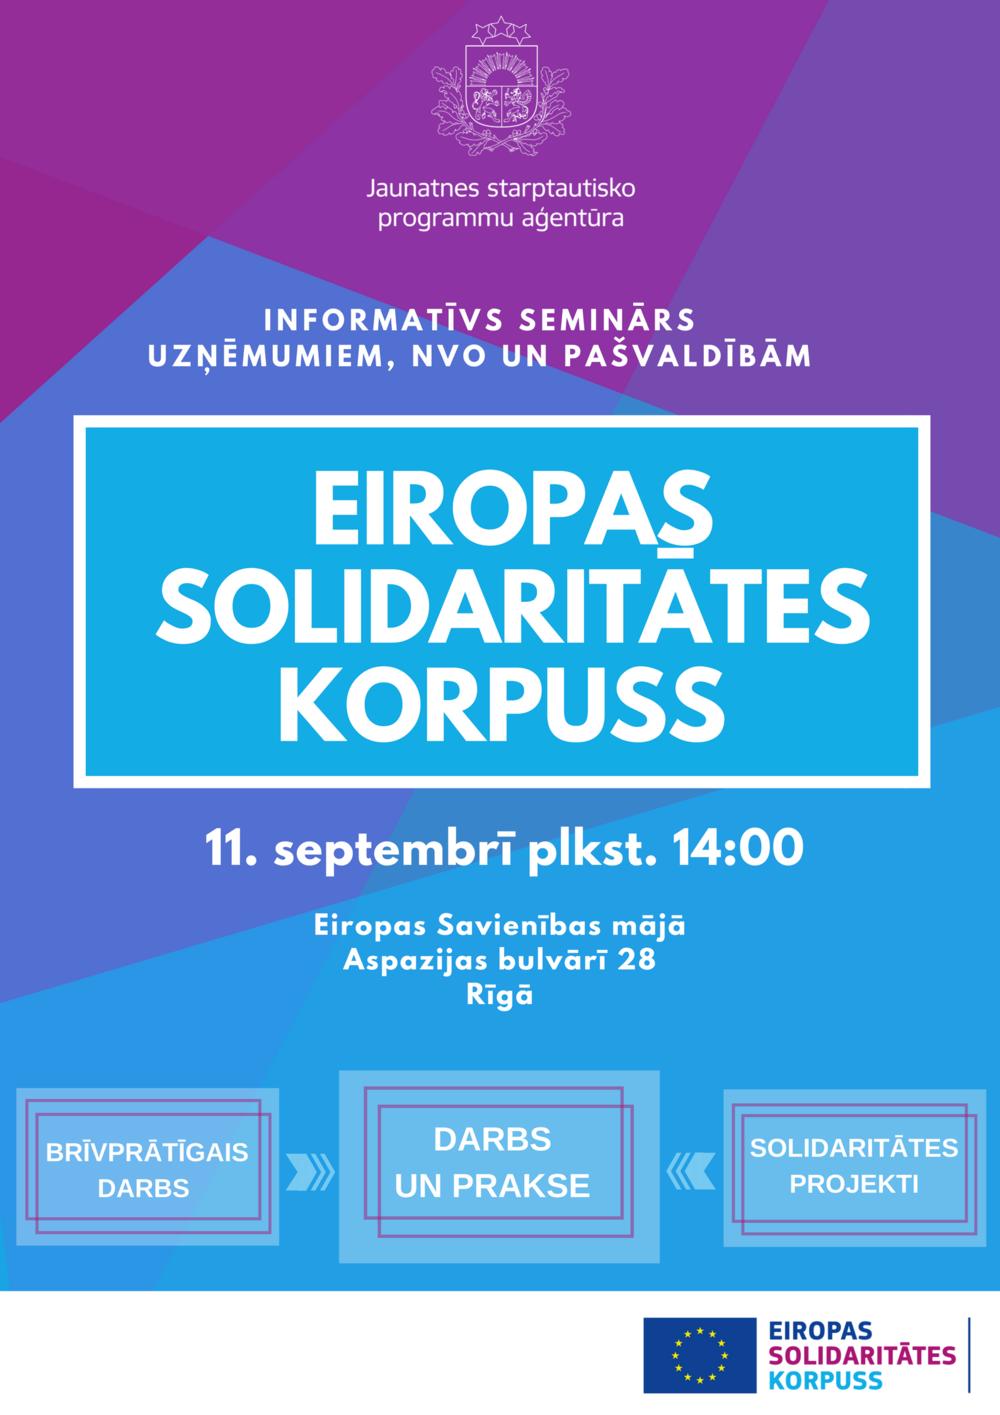 Solidaritātes Korpuss seminārs 11.09.2018 (4).png